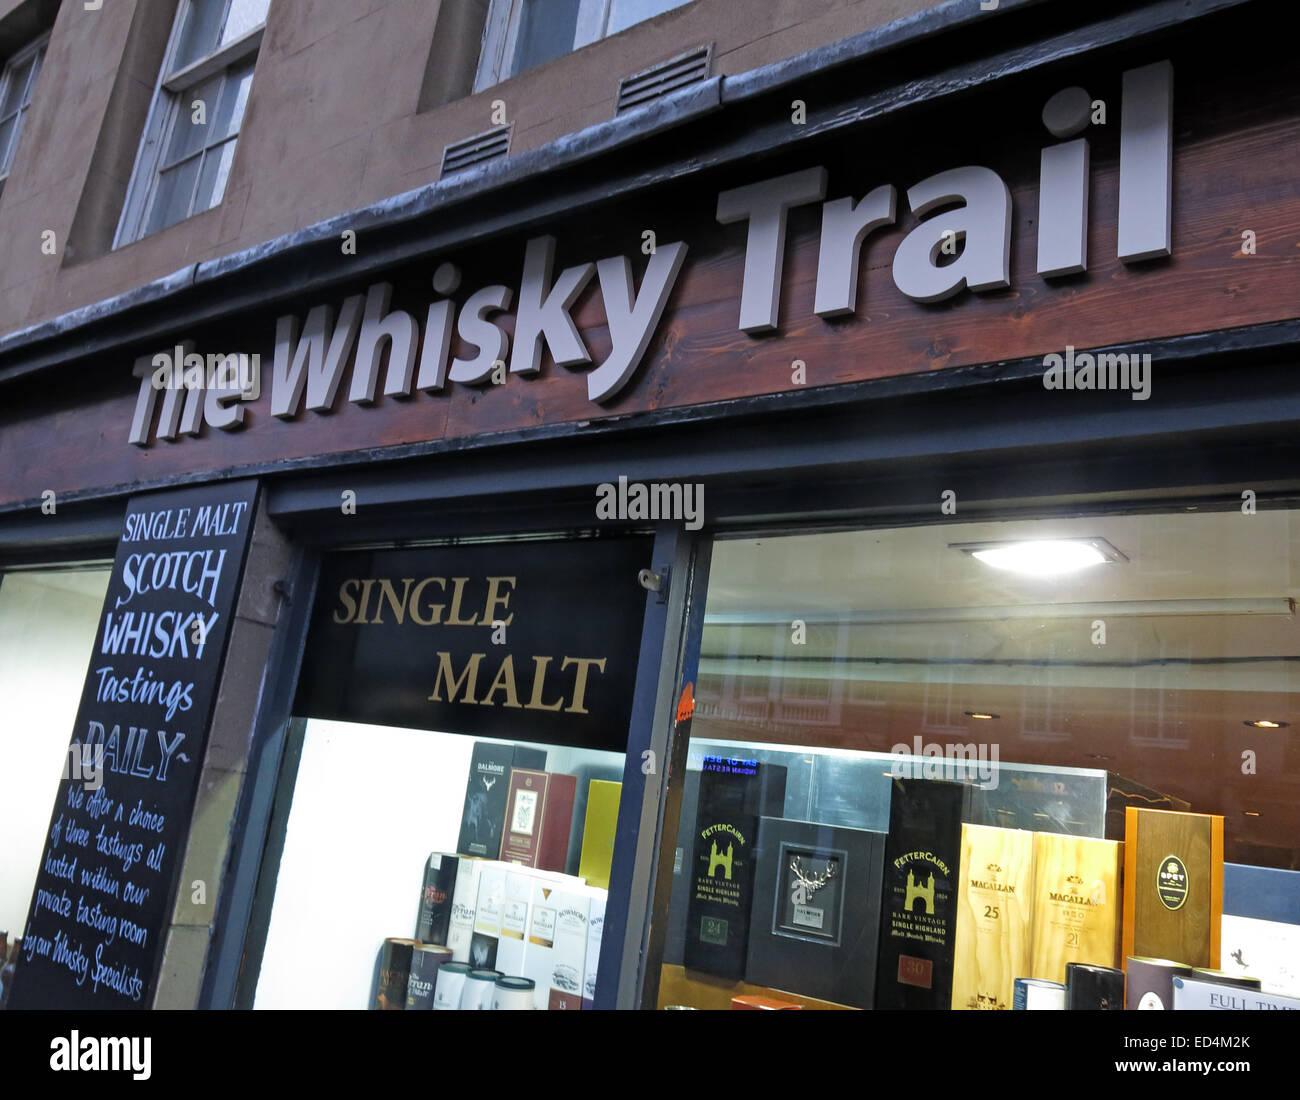 Laden Sie dieses Alamy Stockfoto Edinburgh-Whisky-Trail-Shop, Scotland, UK - ED4M2K